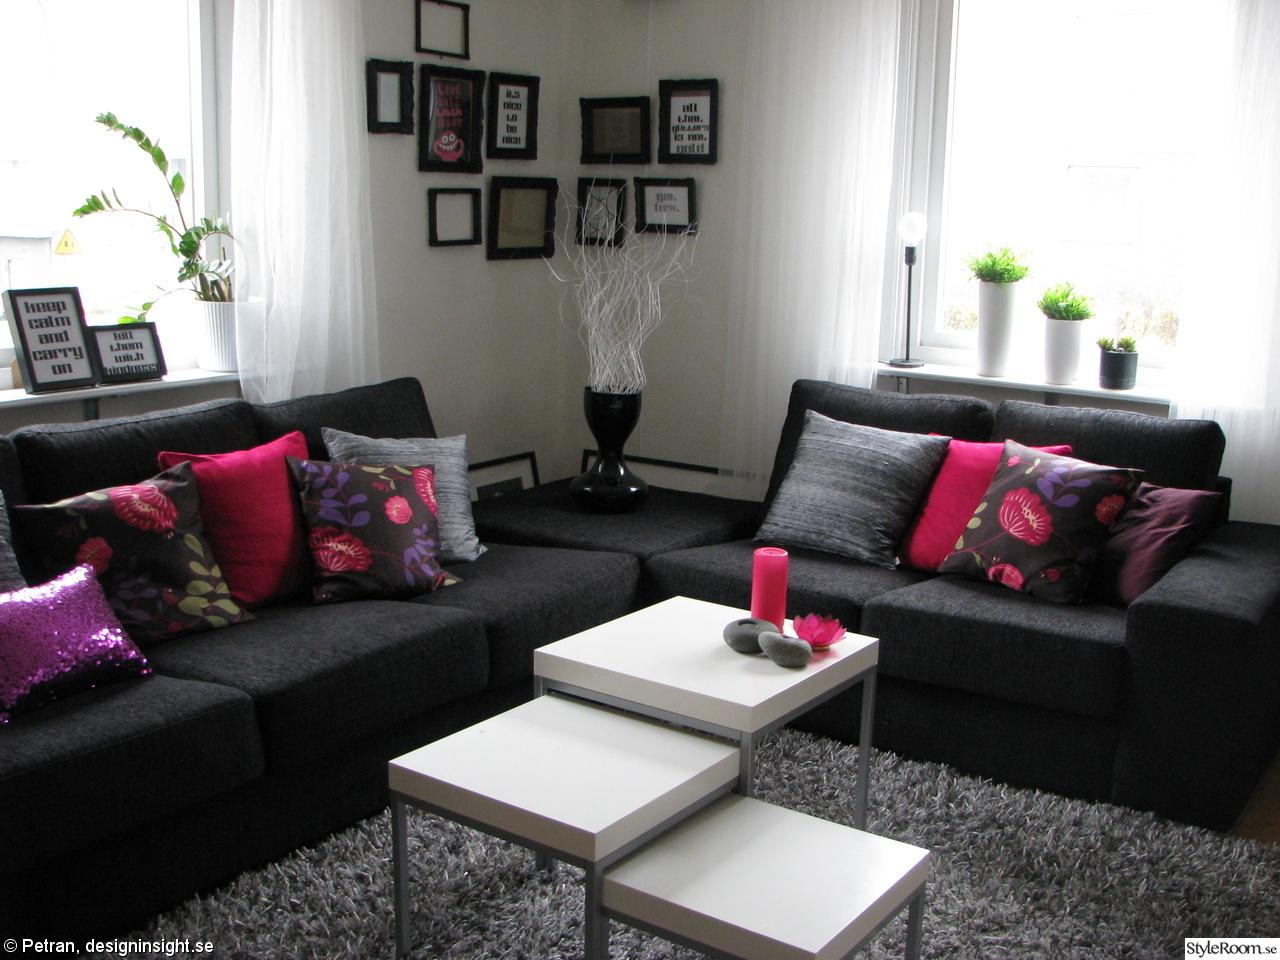 Vardagsrum,soffa,ramar,matta,rya,grå,svart,kuddar,färg